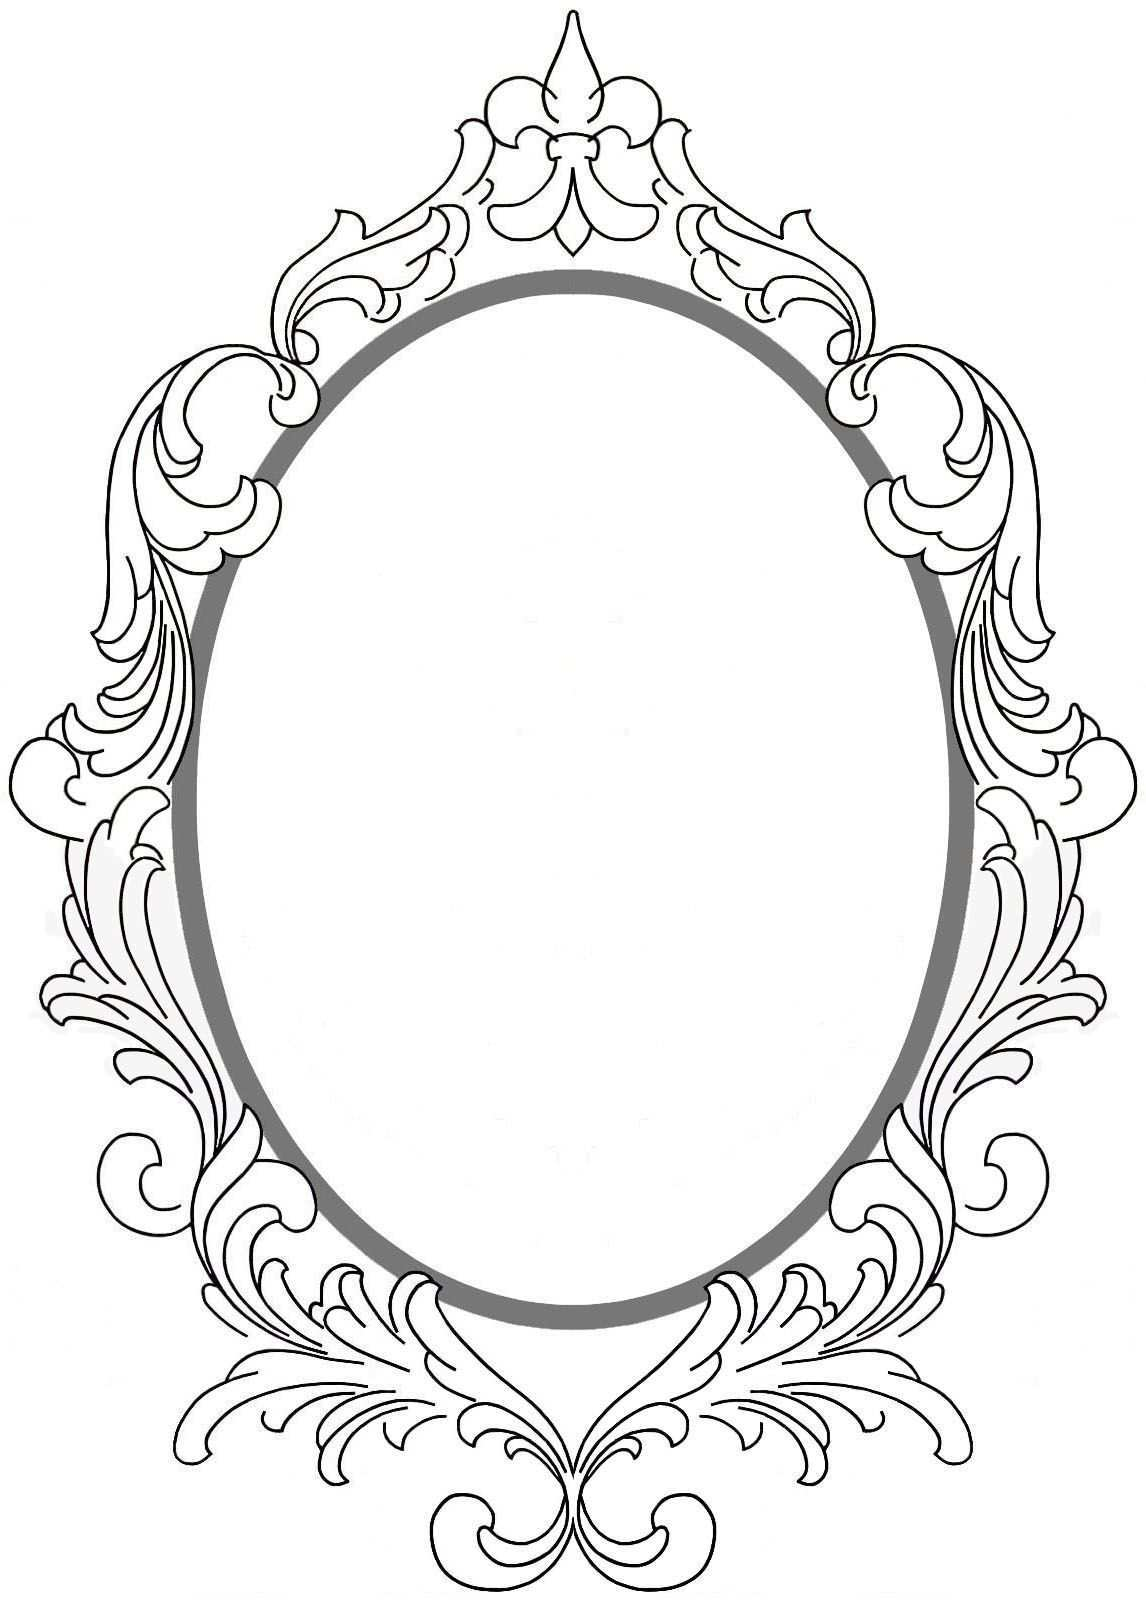 Rahmen Framed Tattoo Mirror Tattoos Vintage Frames